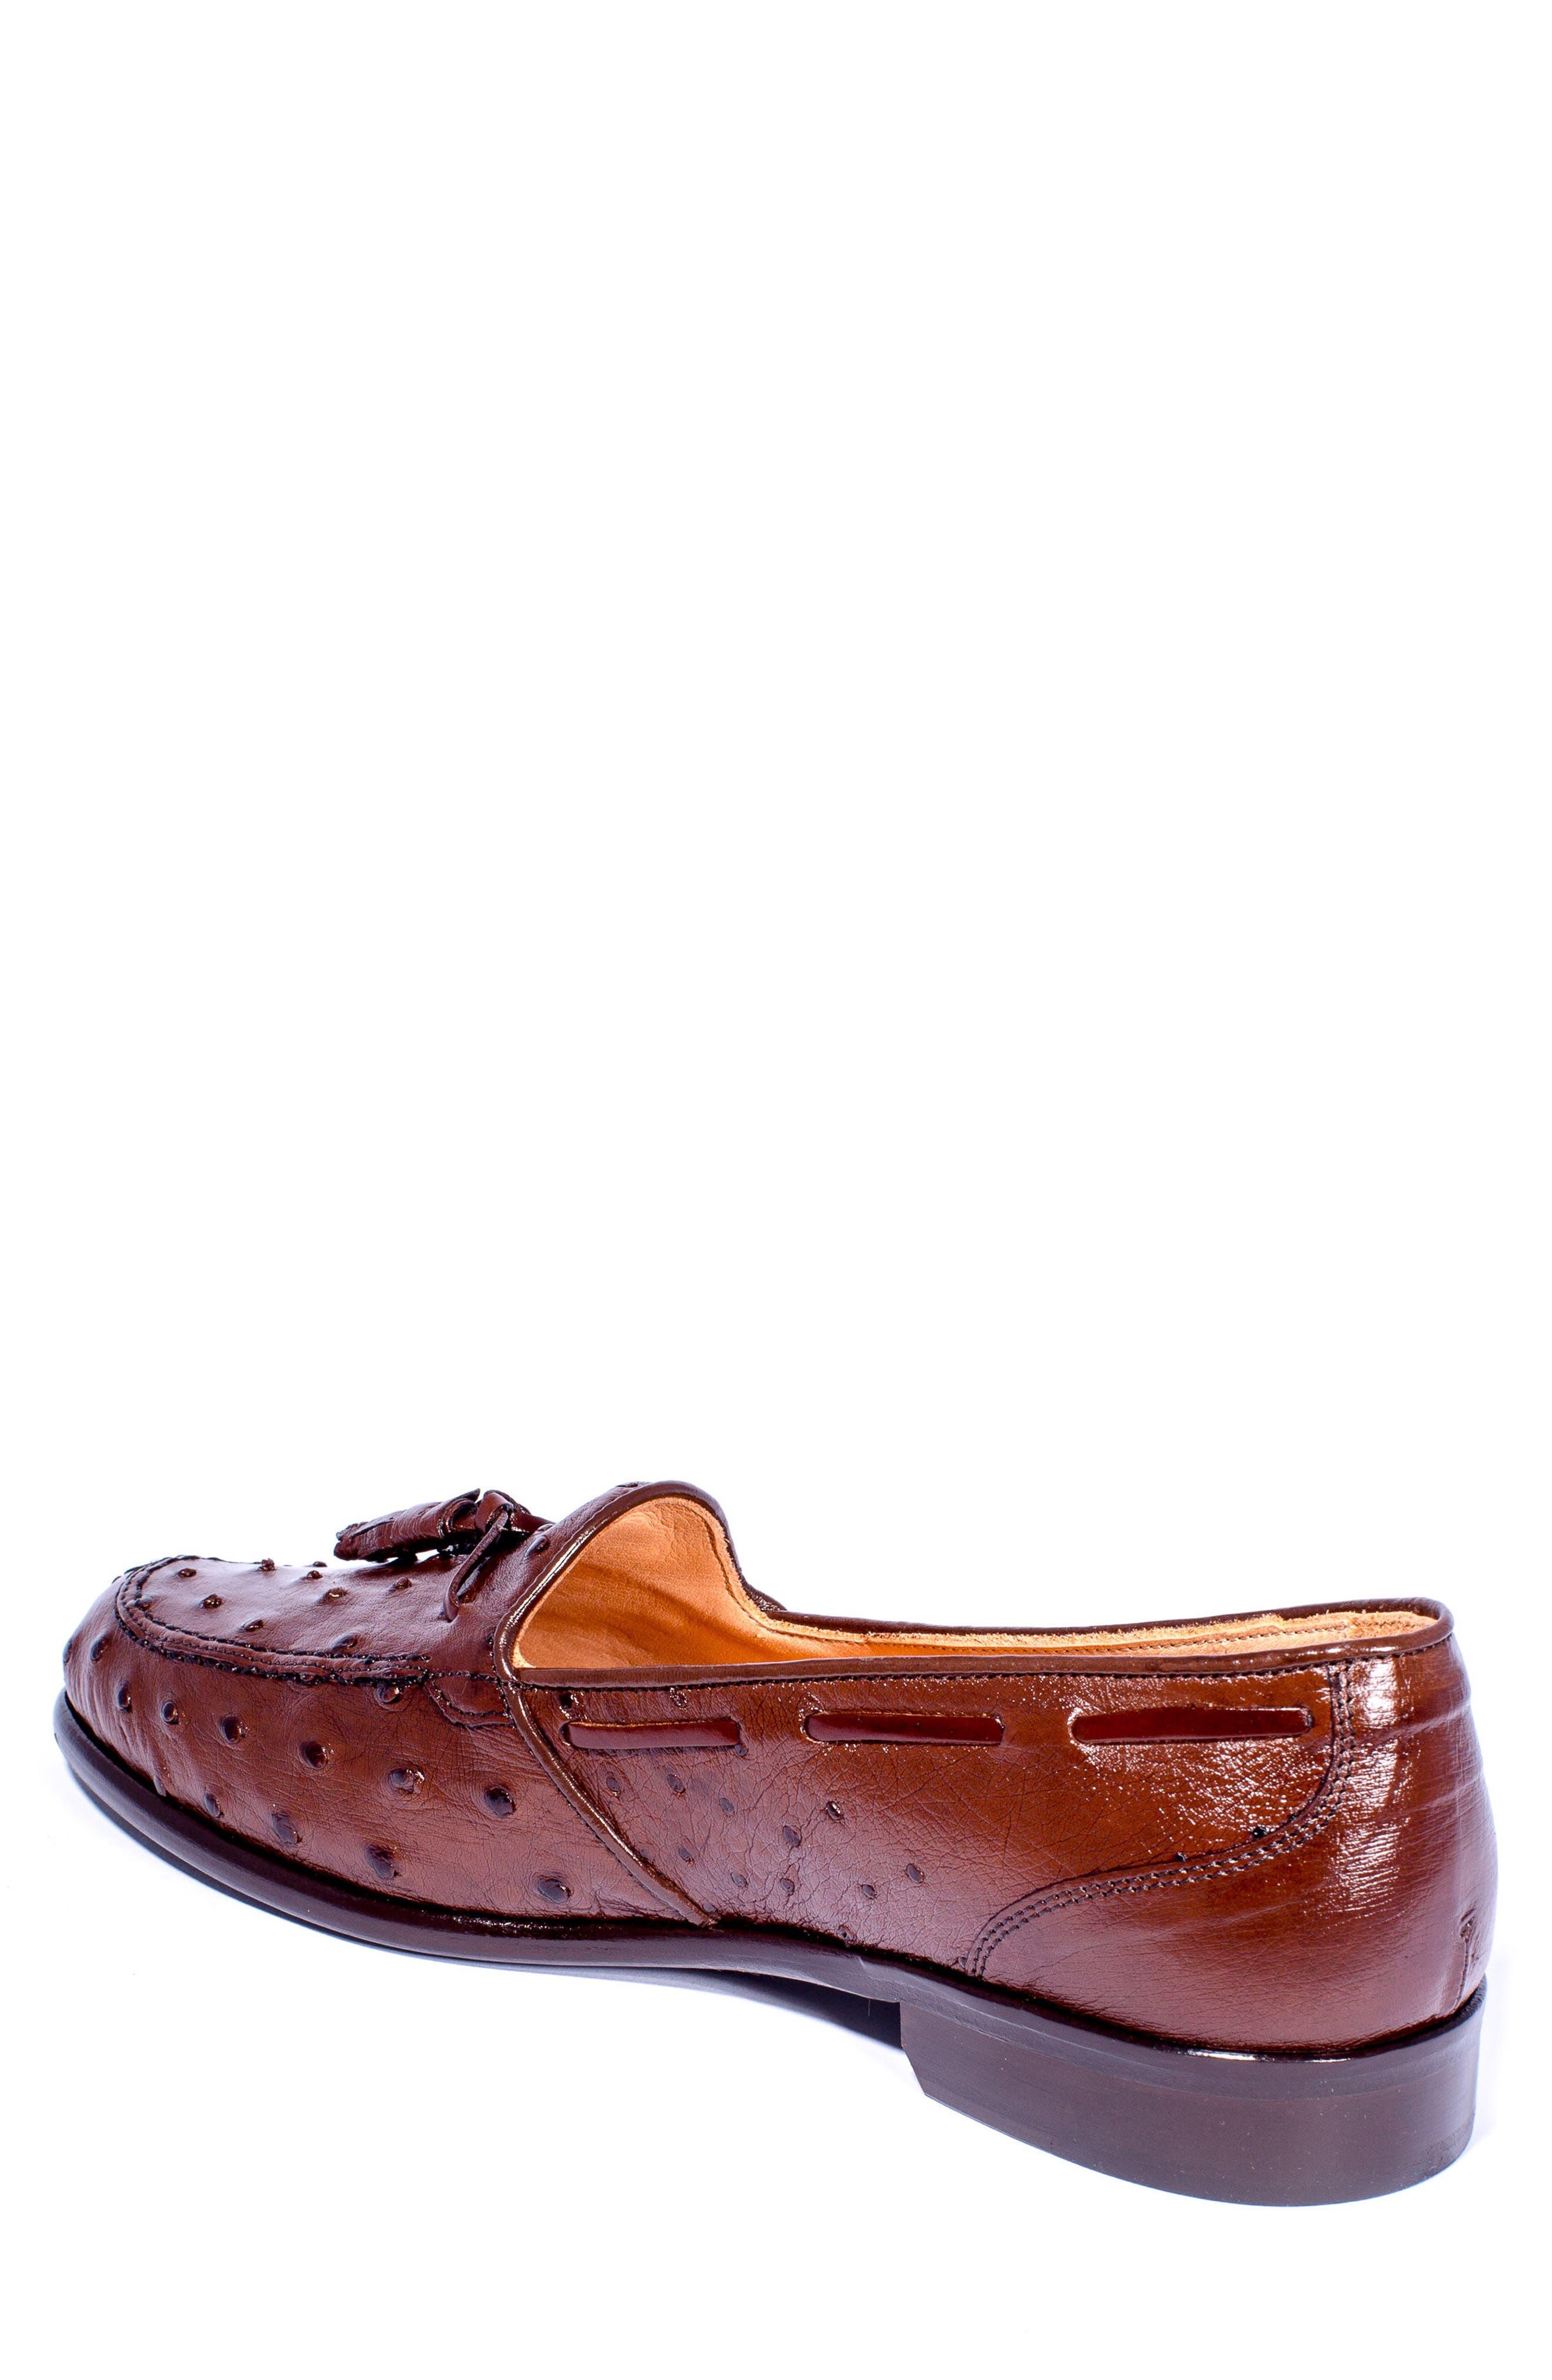 Franco Tassel Exotic Leather Loafer,                             Alternate thumbnail 4, color,